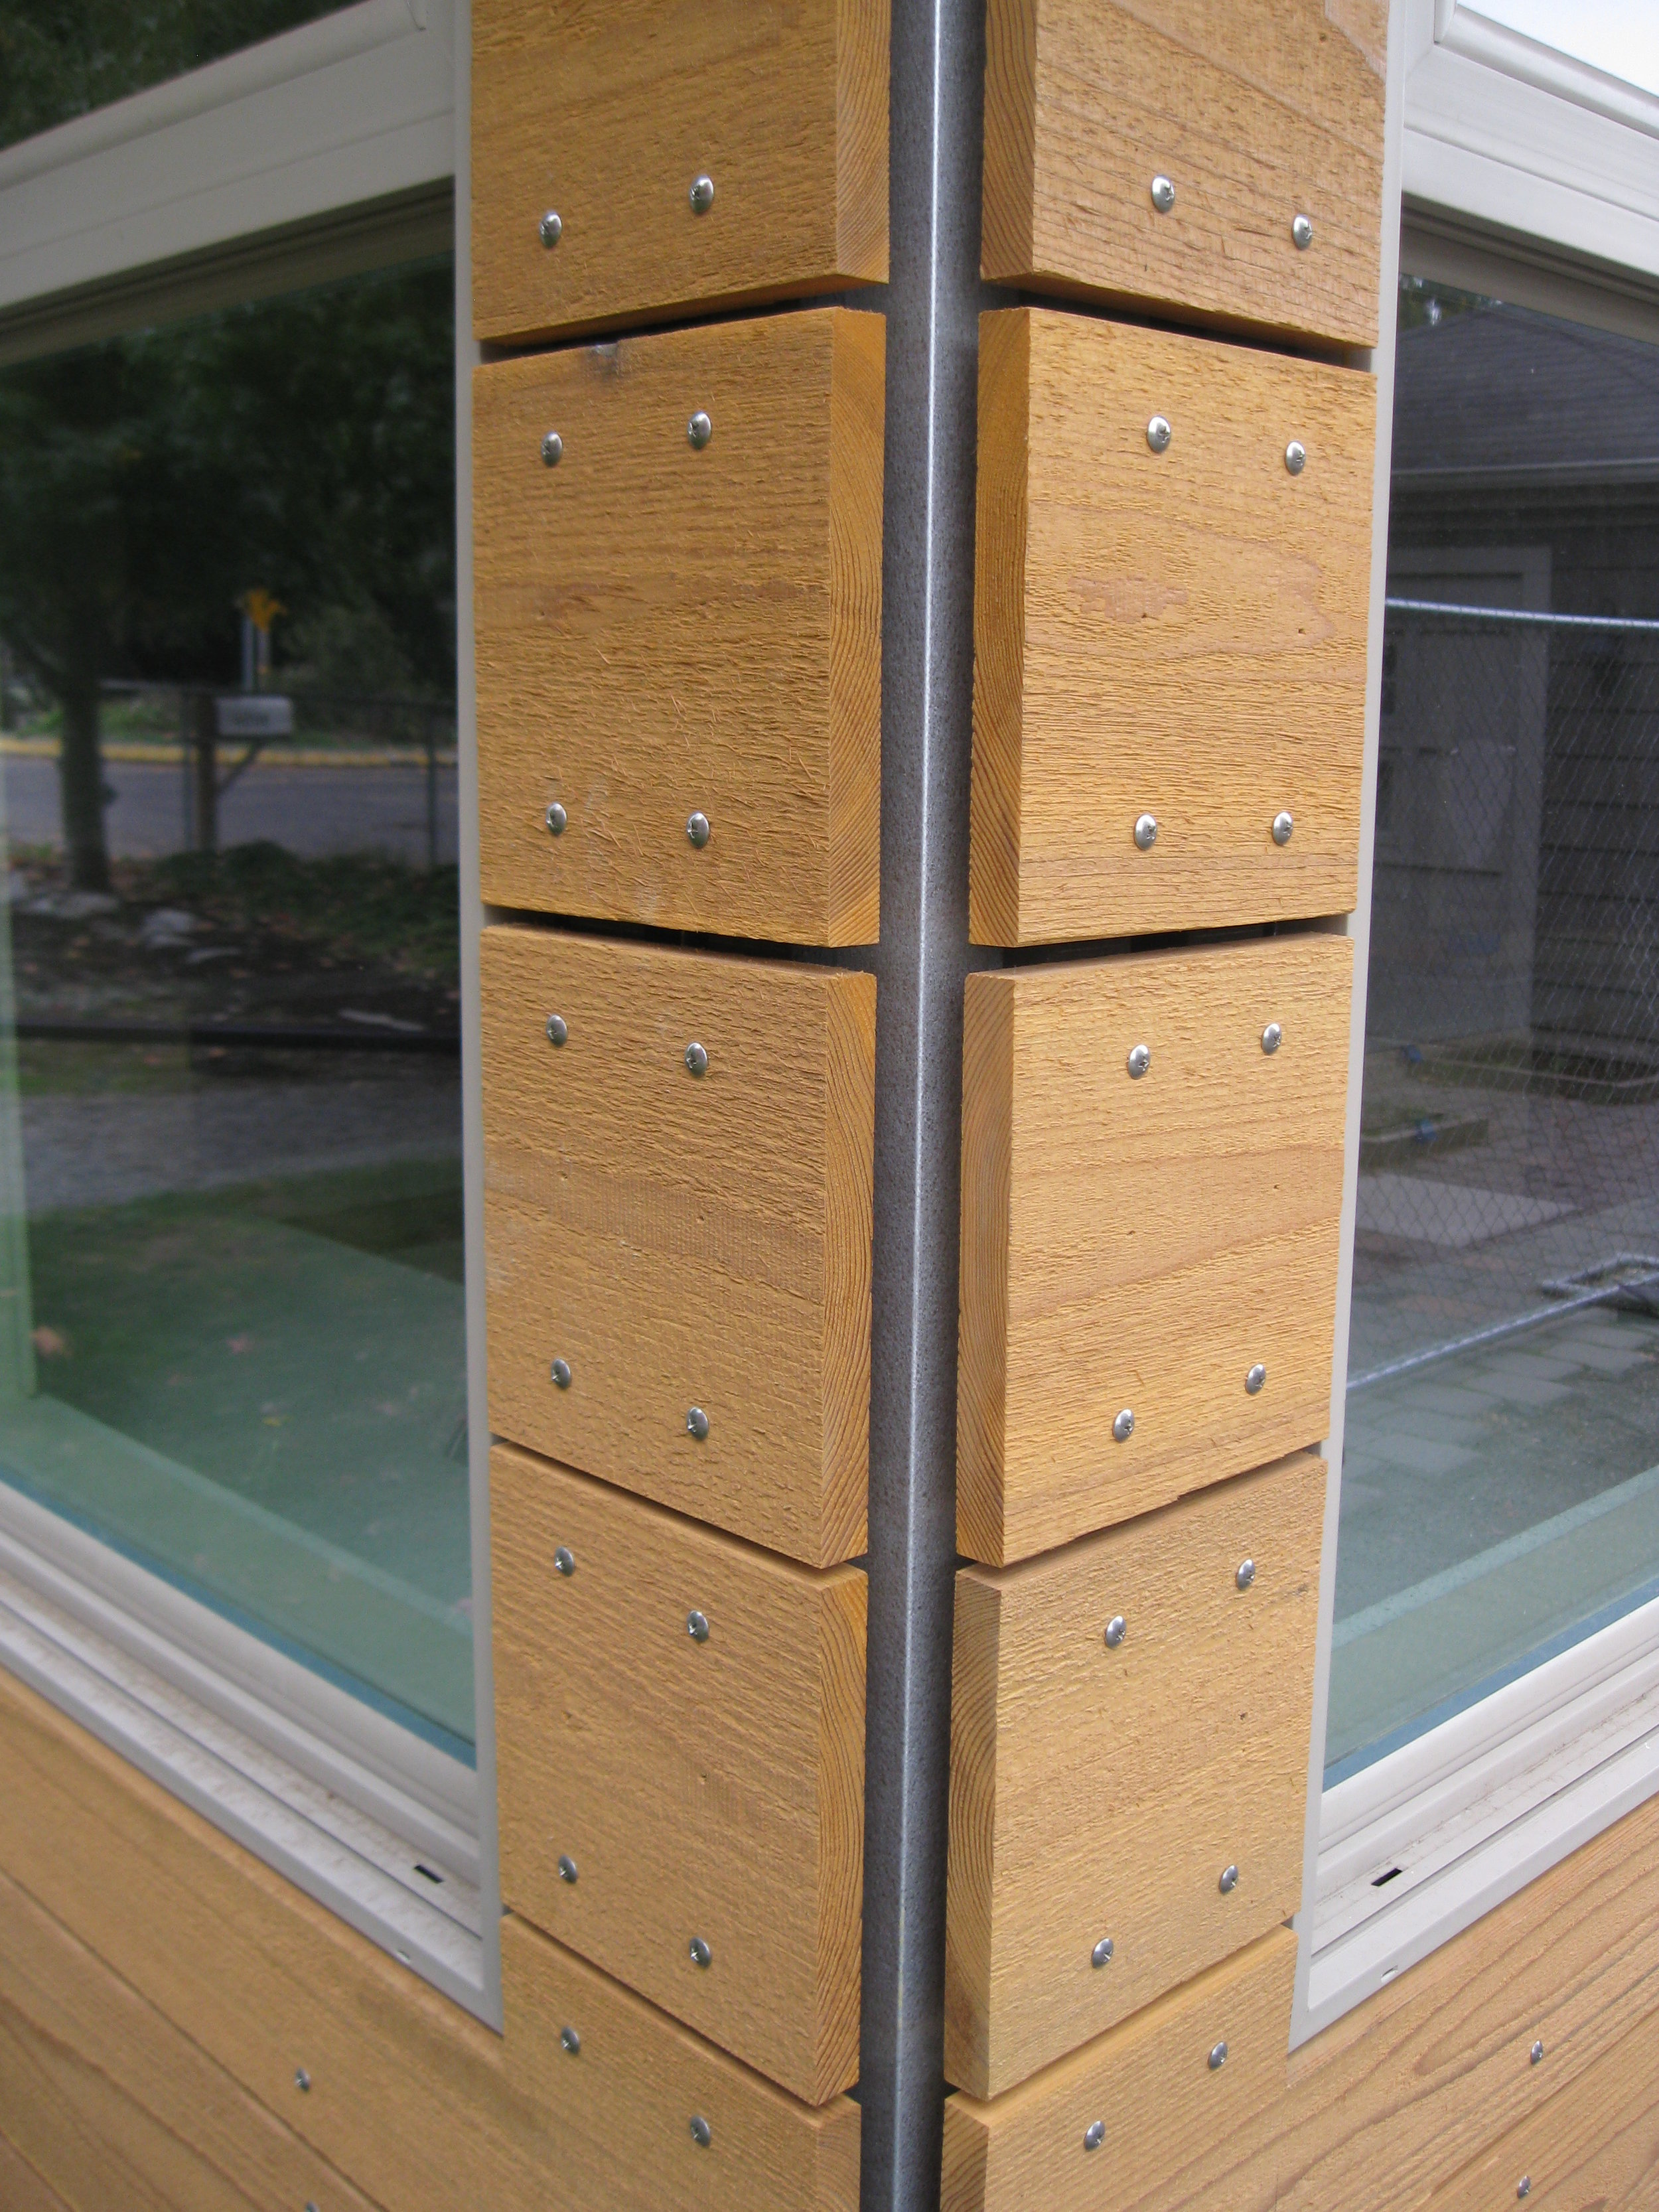 Open Butt Joint Rain Screen with Corner Metal